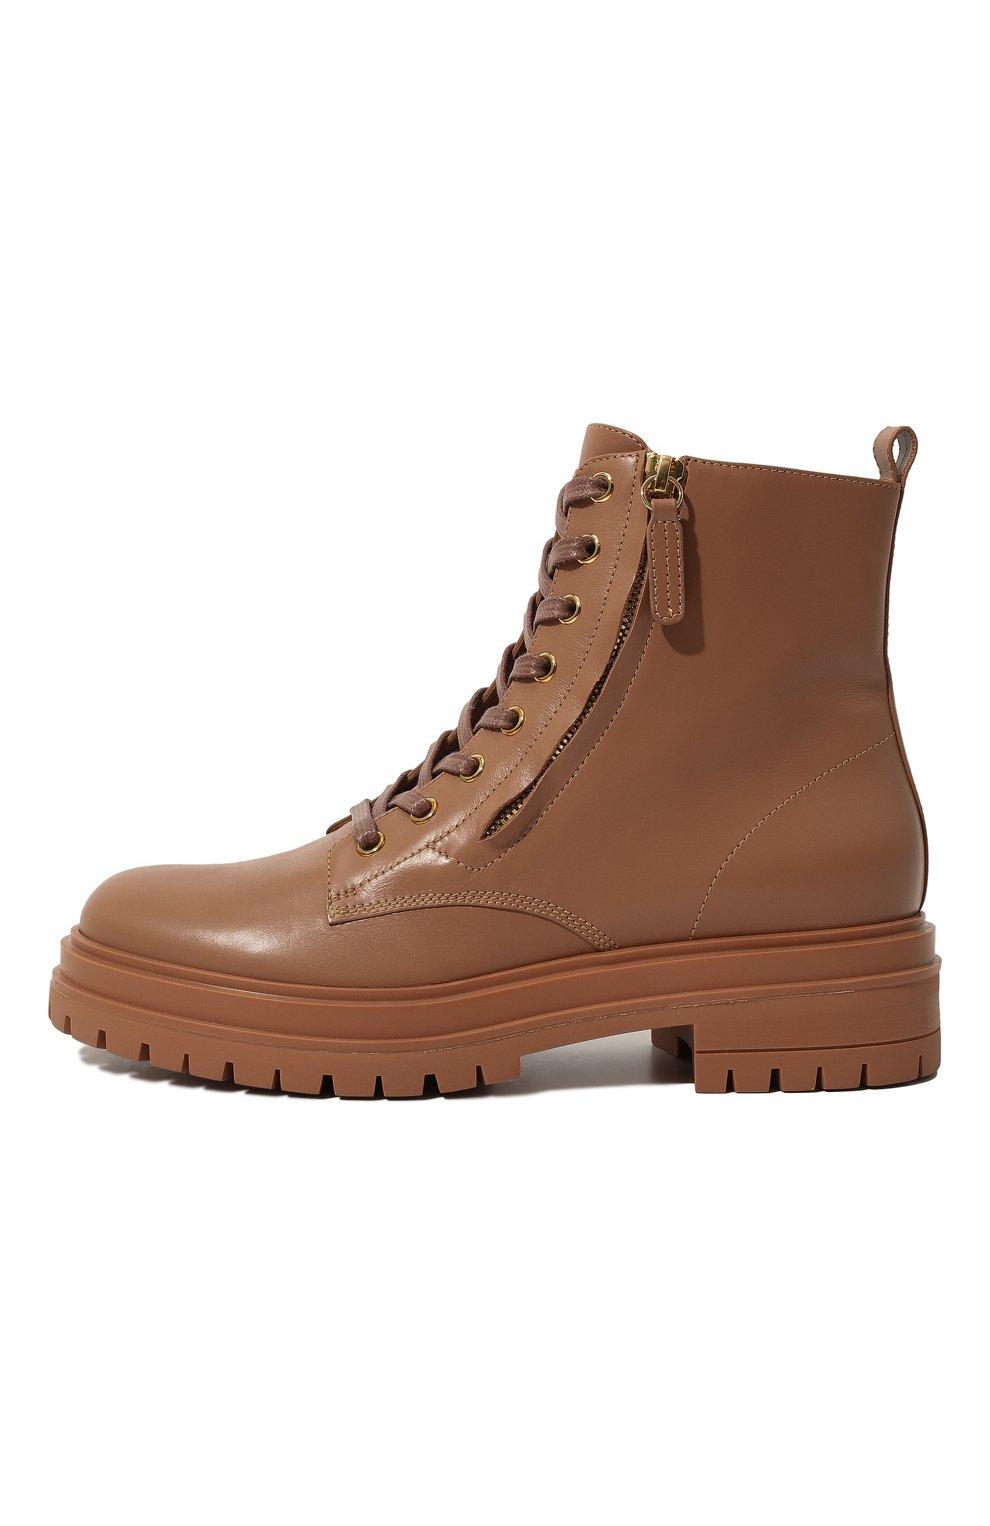 Женские кожаные ботинки turon GIANVITO ROSSI бежевого цвета, арт. G73432.20G0M.CLNPRAL | Фото 4